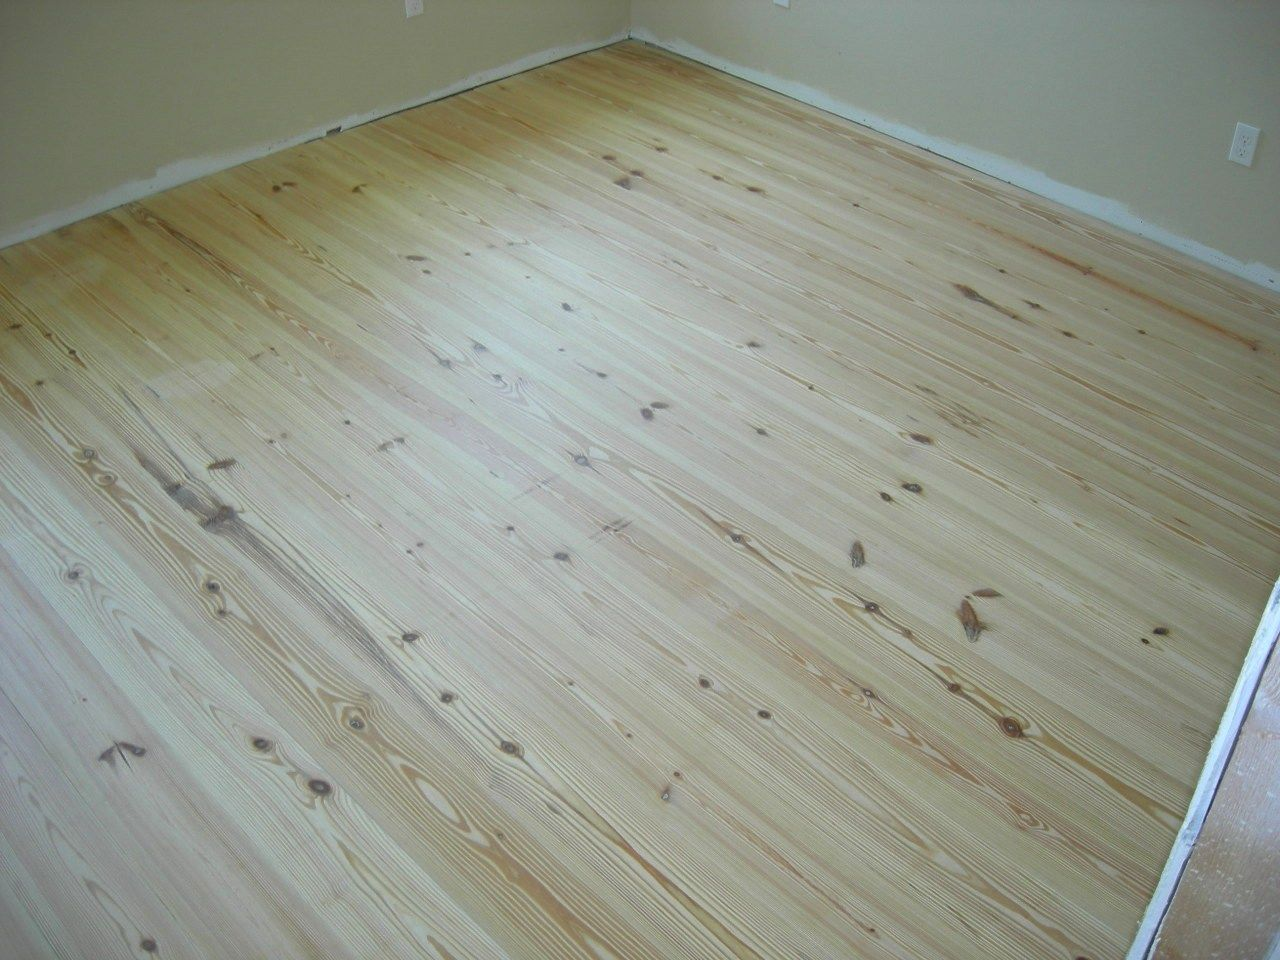 Unfinished Heart Pine Flooring - around $3 per sq ft plus ...